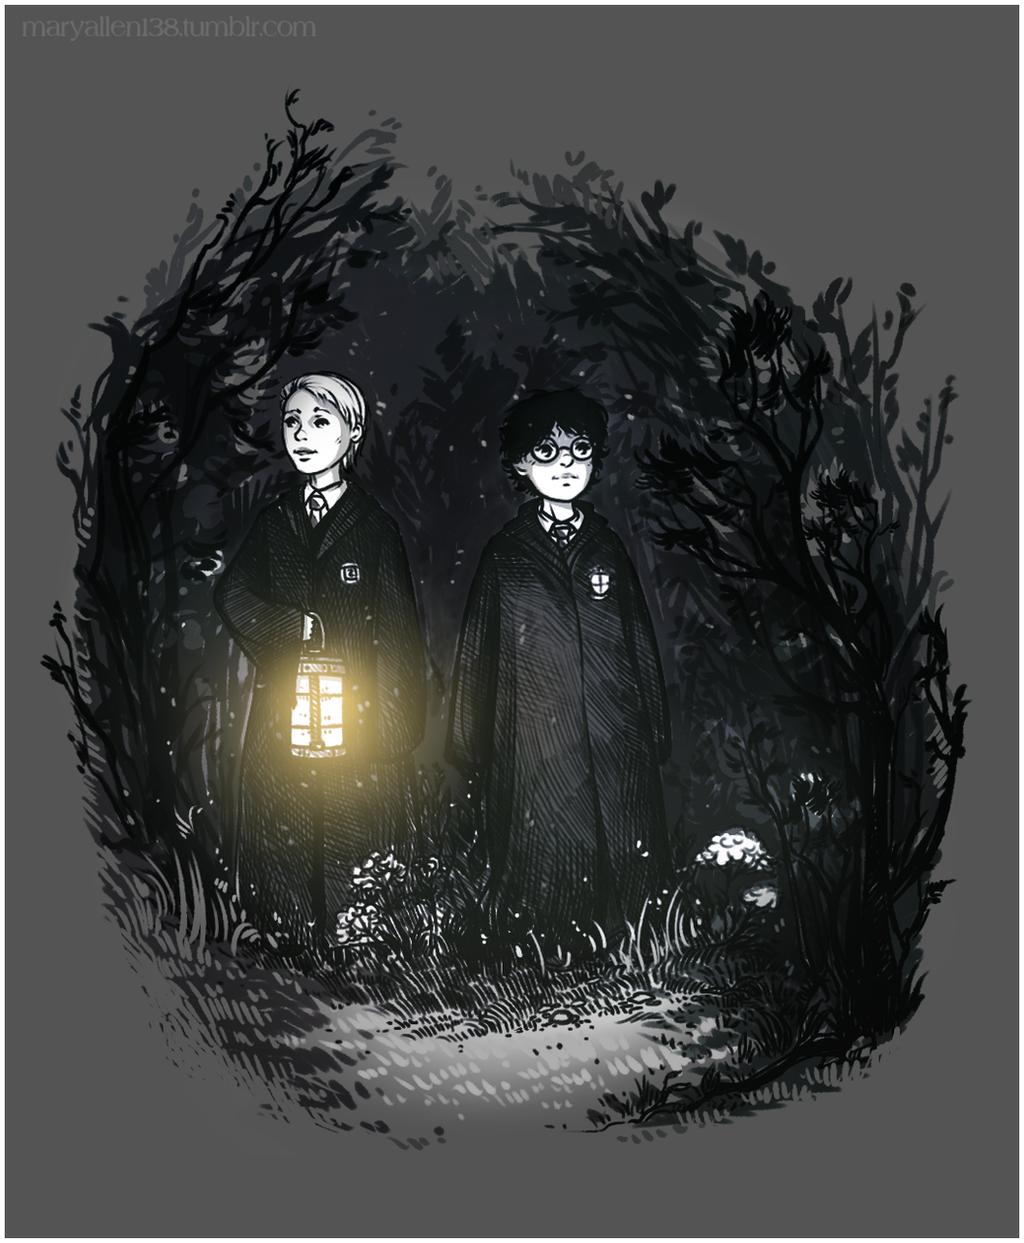 Harry Potter|Draco Malfoy by maryallen138